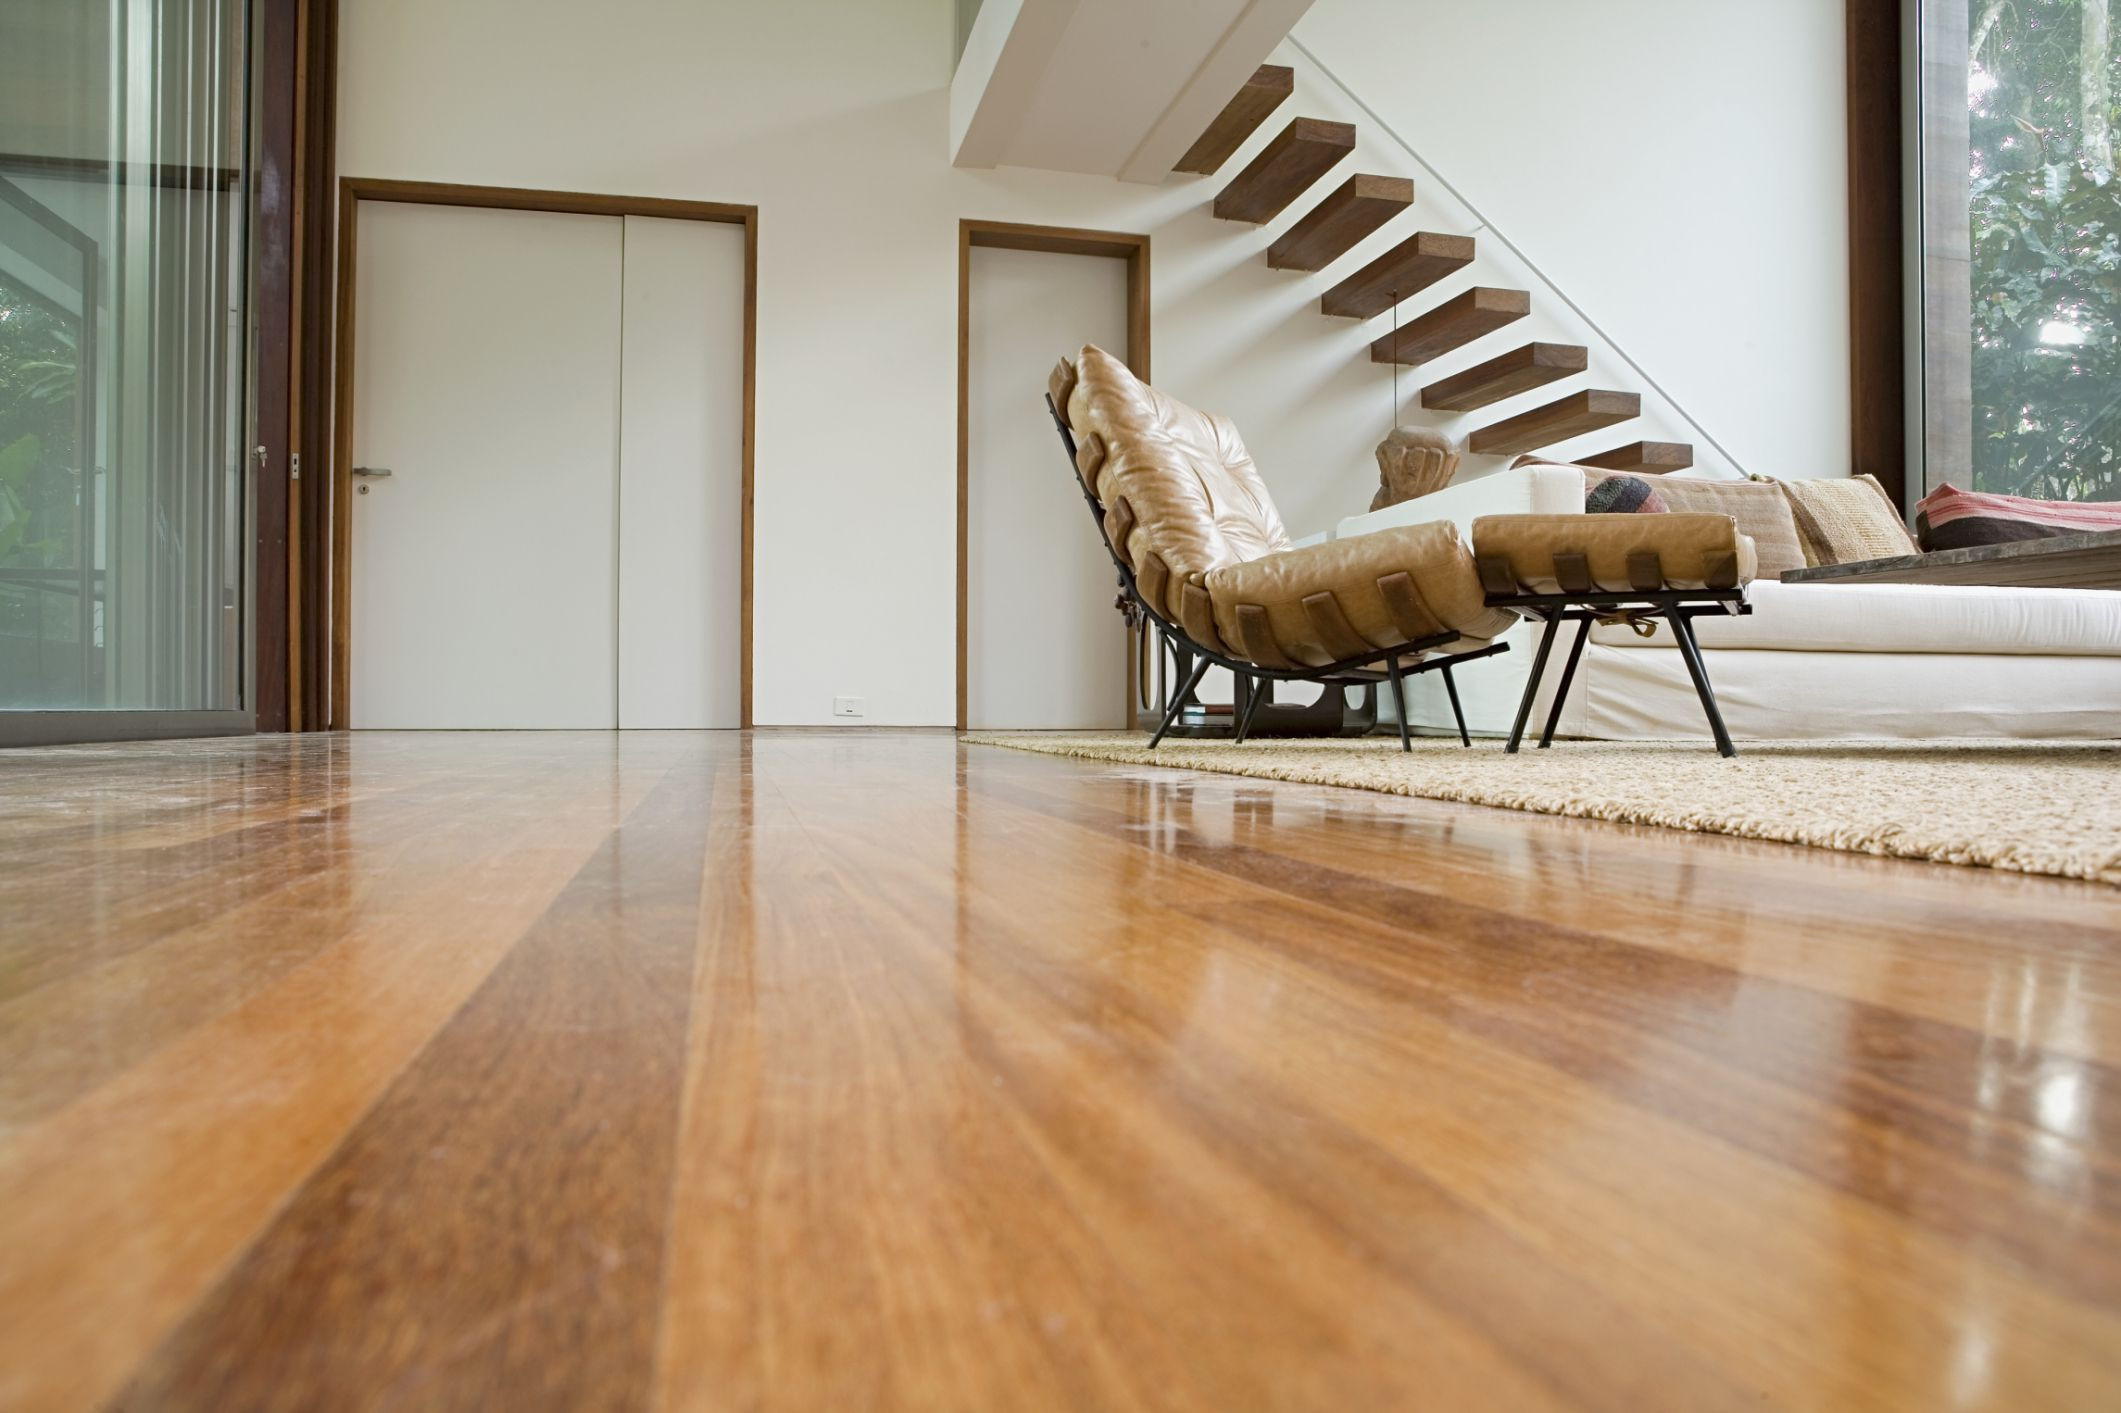 engineered hardwood flooring vs laminate flooring of engineered wood flooring vs solid wood flooring with 200571260 001 highres 56a49dec5f9b58b7d0d7dc1e